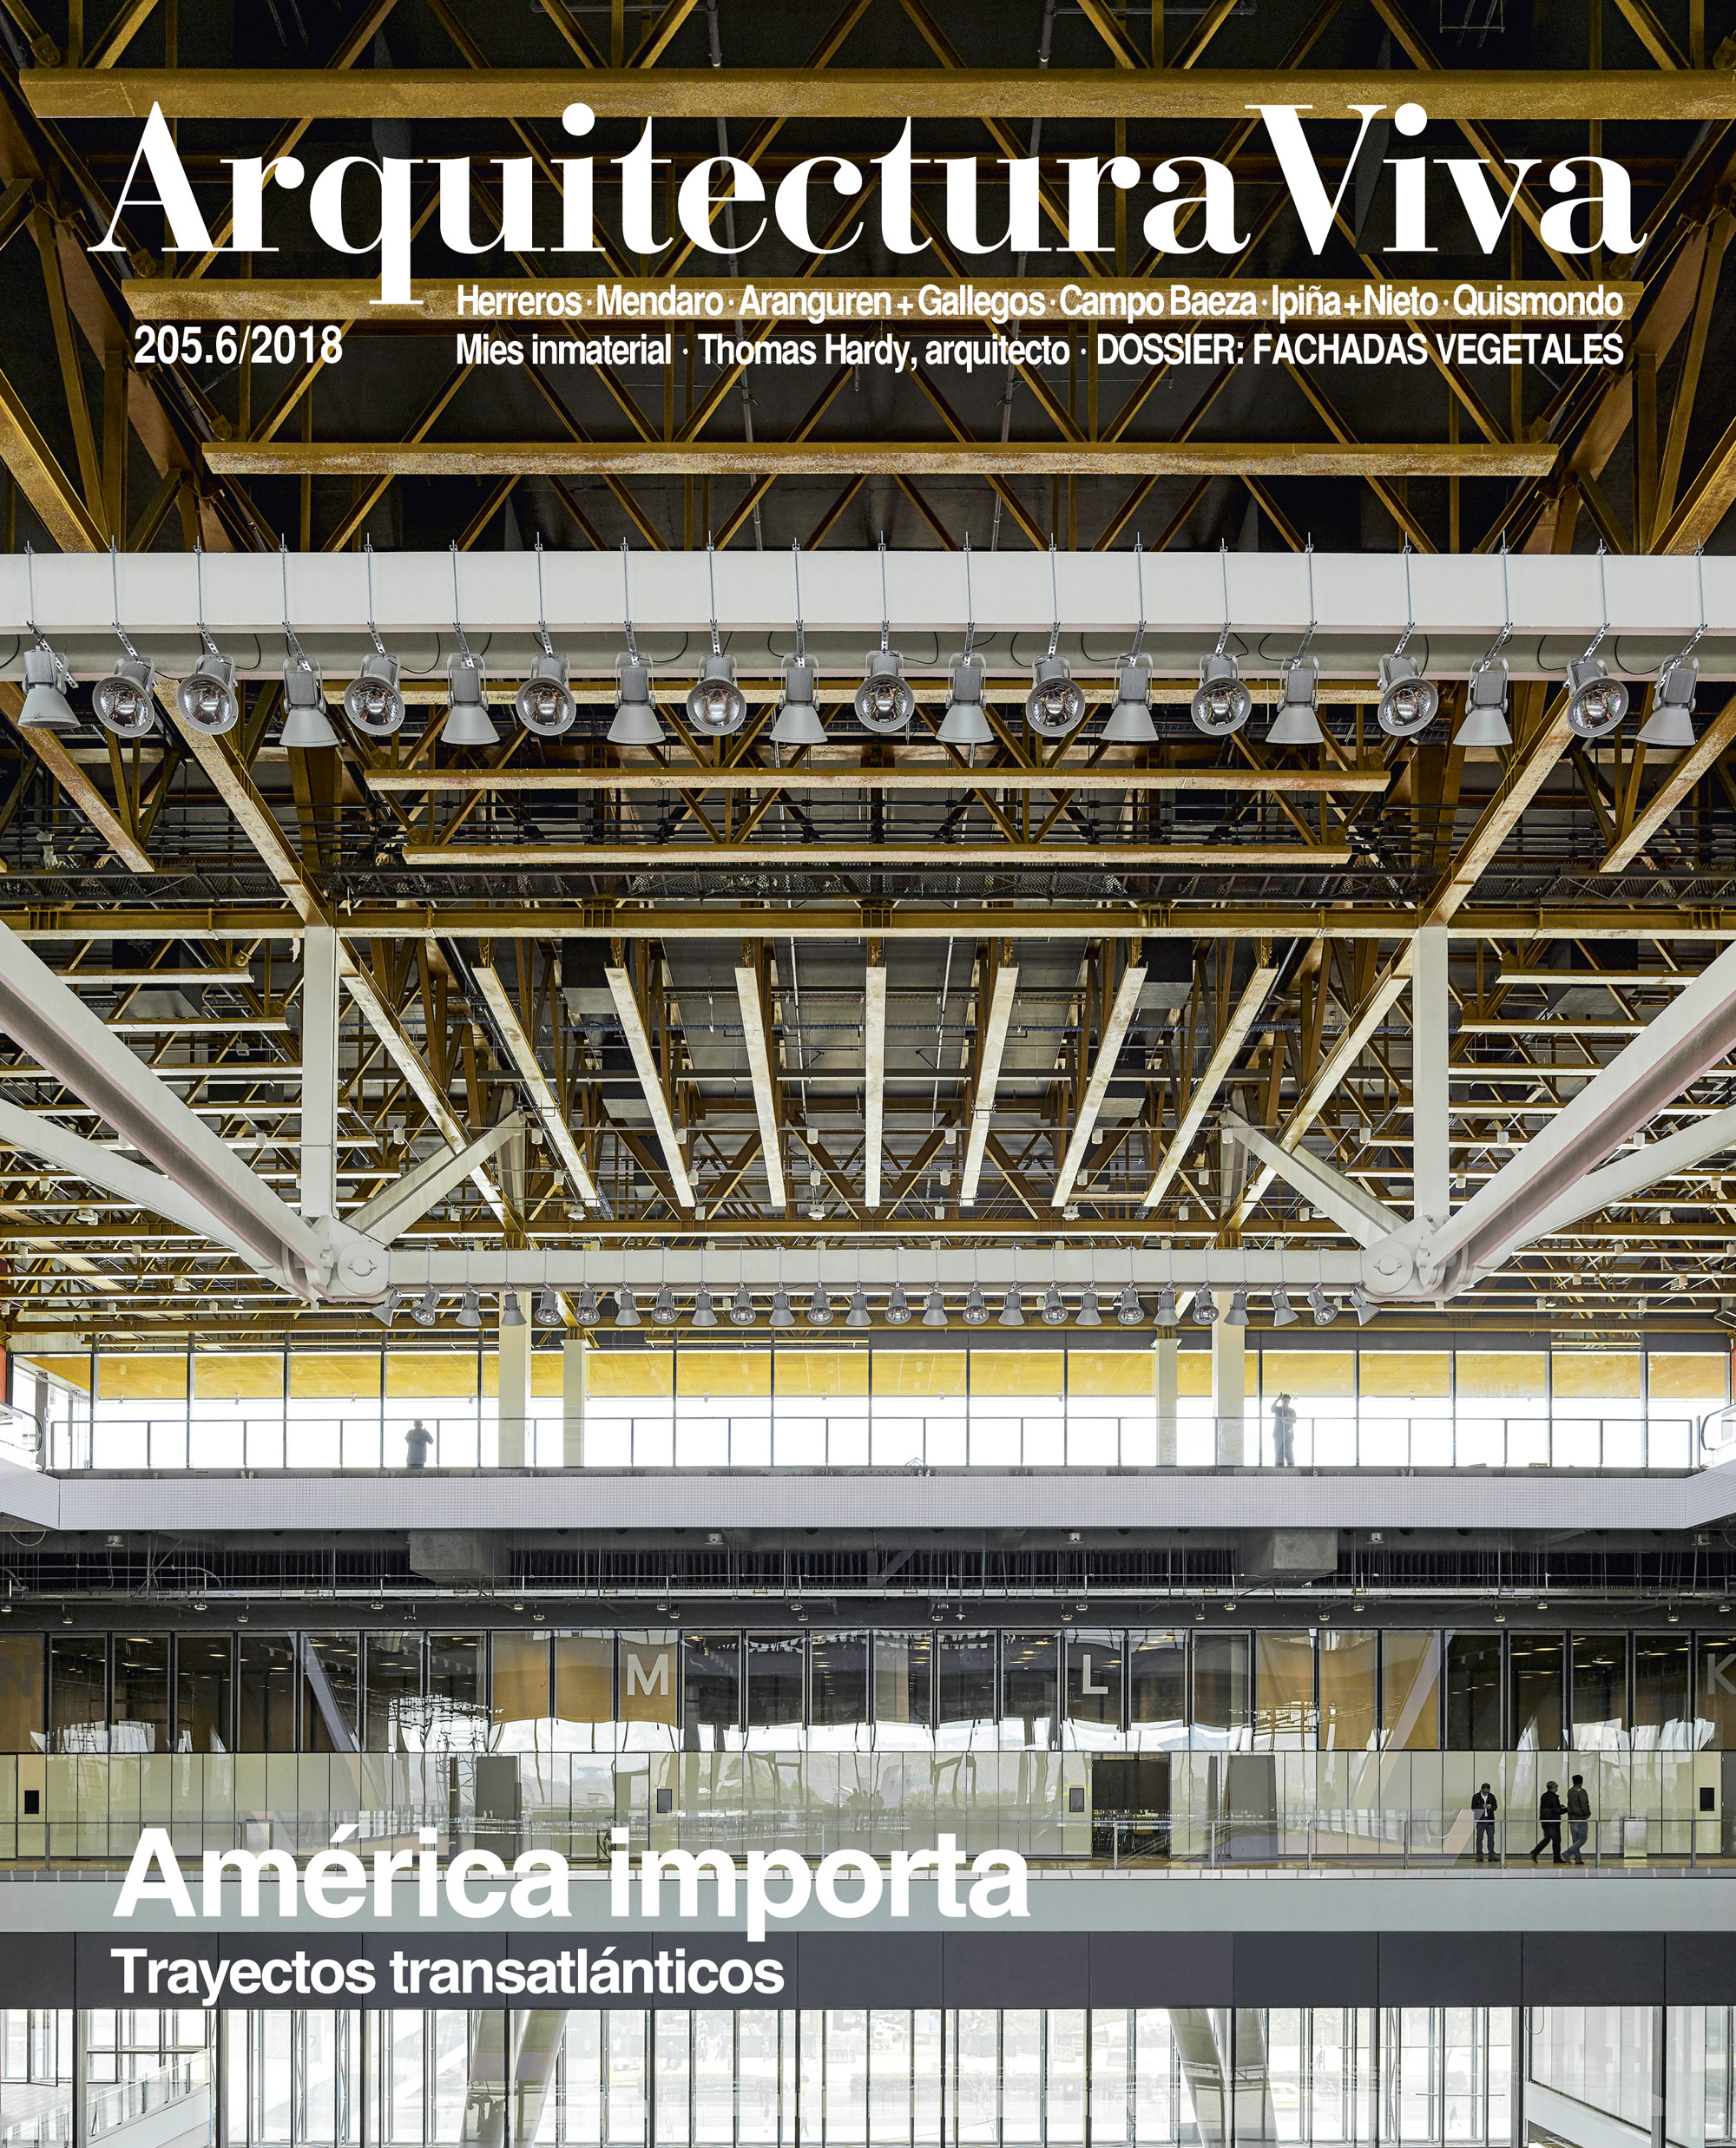 America Imports